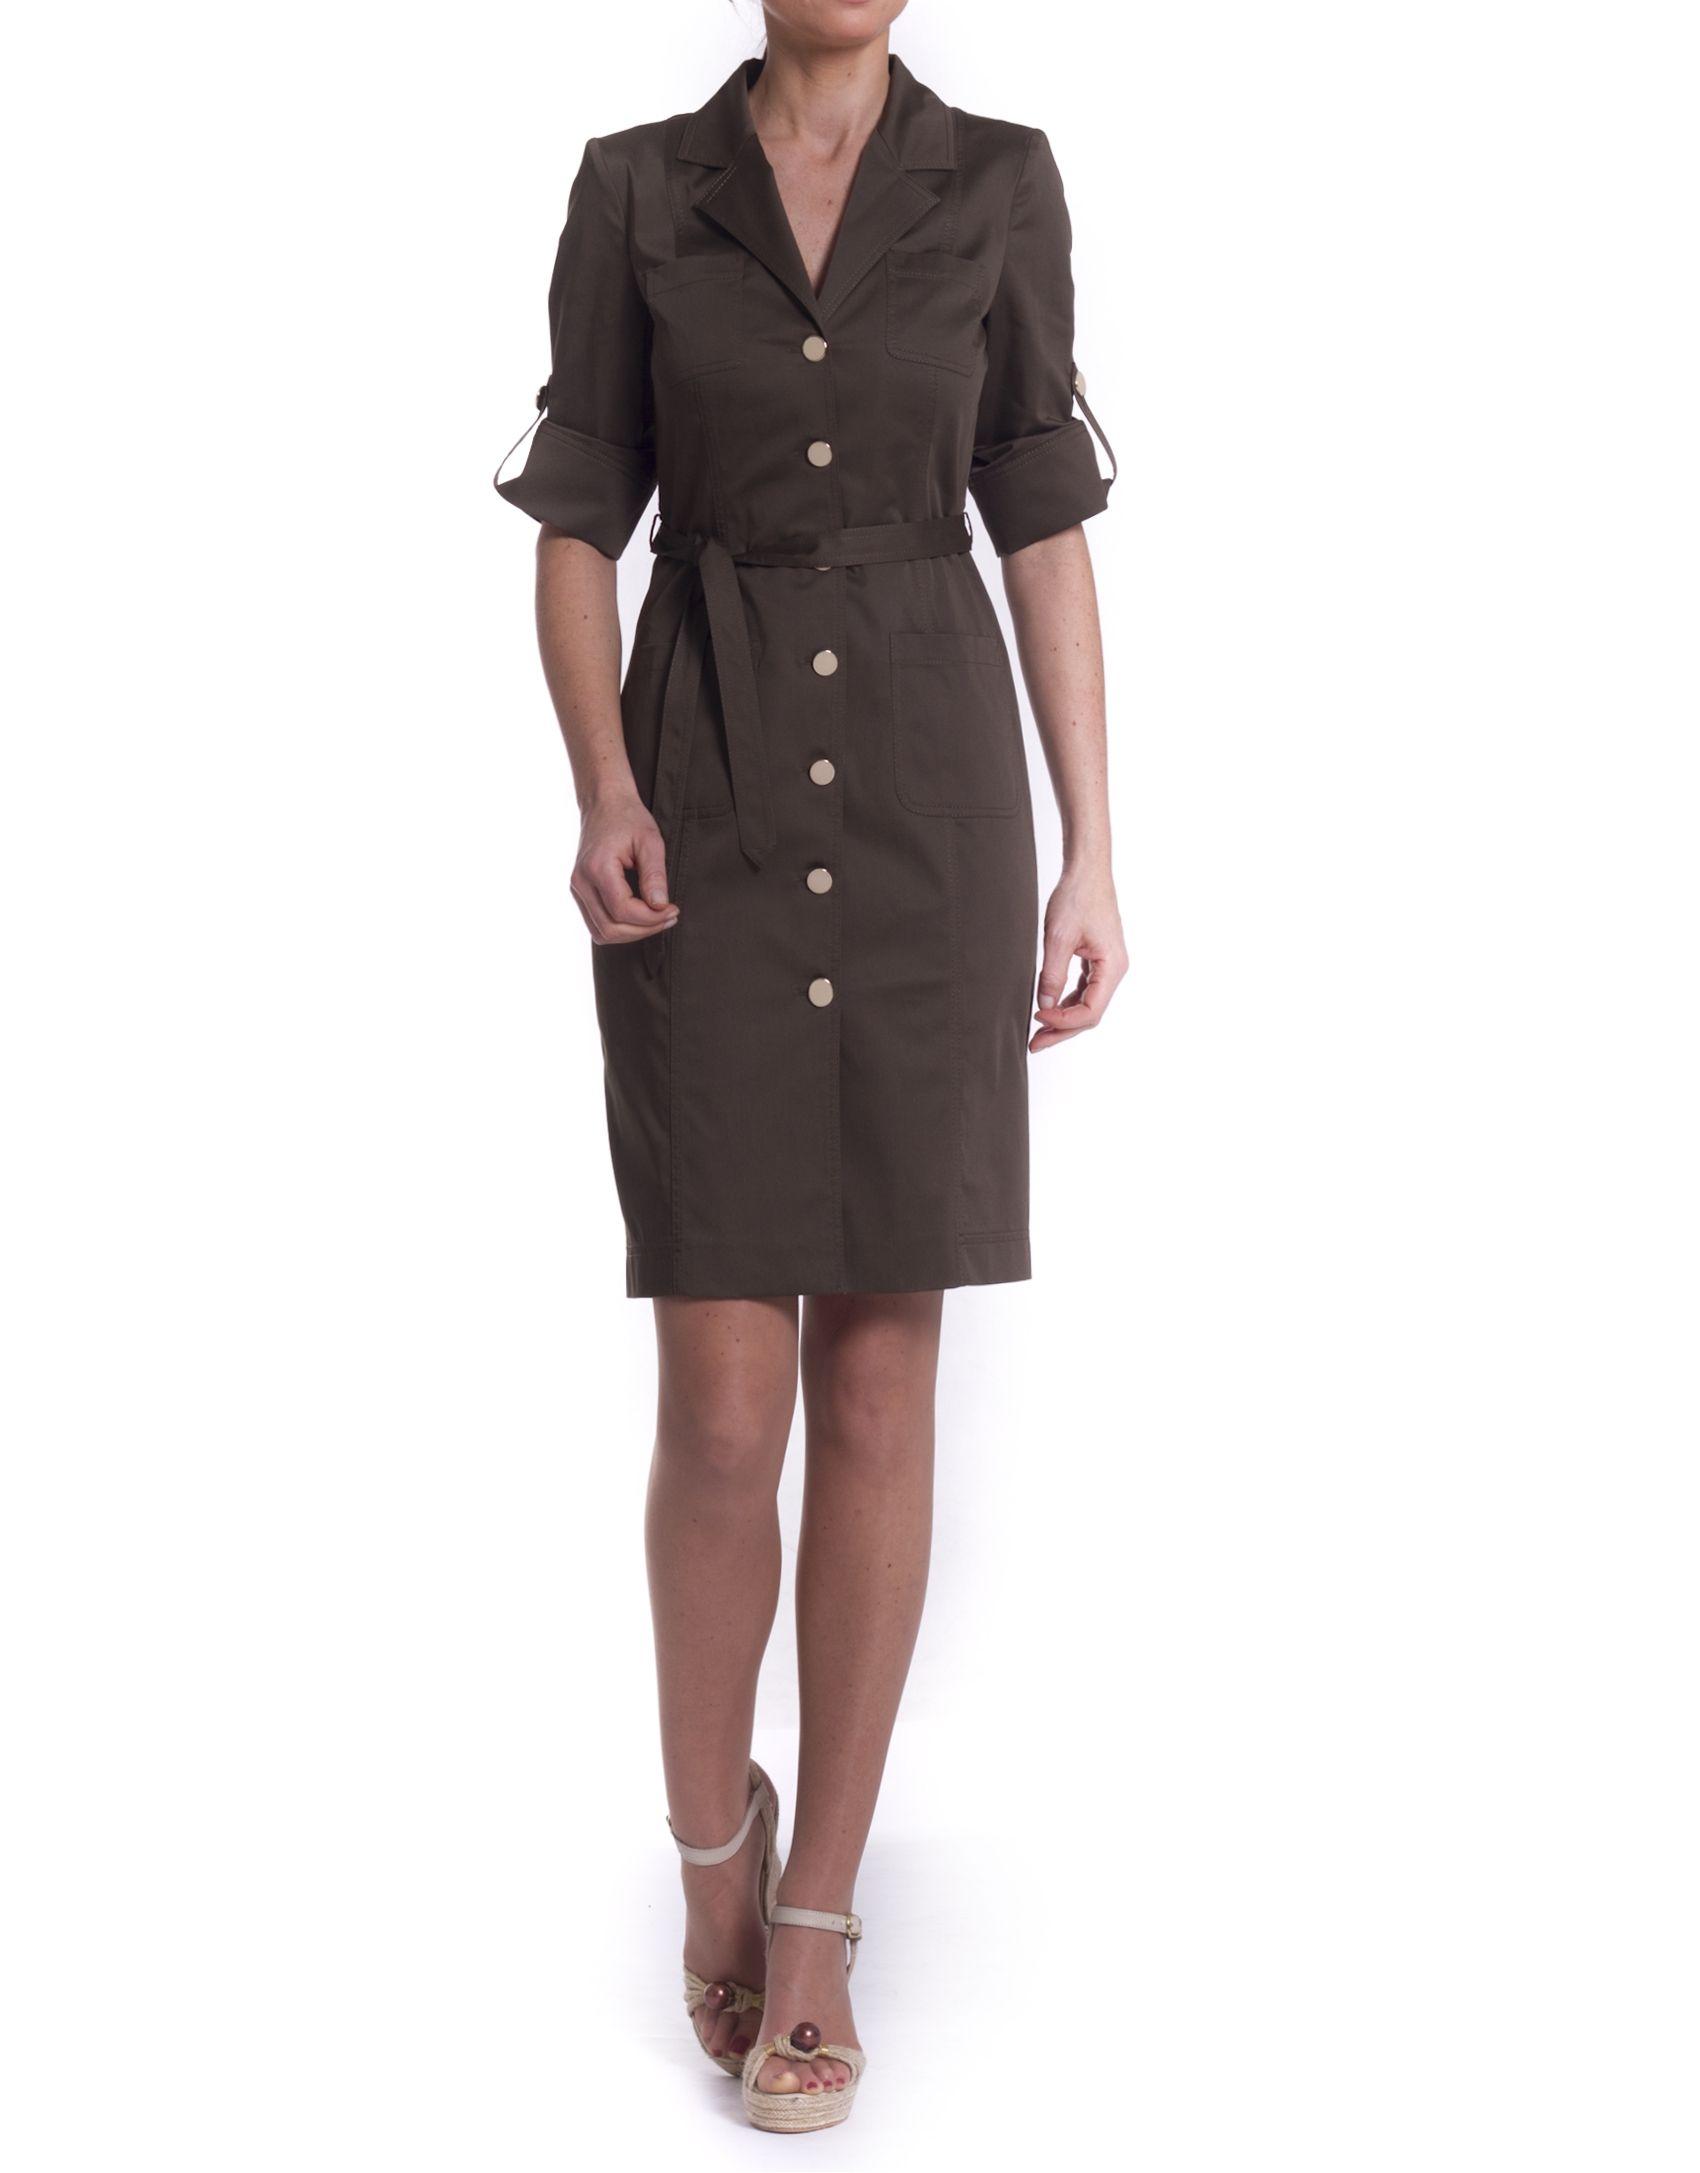 210aa9d5a vestido-camisero-caqui-manga-corta.jpg 1.700×2.173 píxeles Vestidos